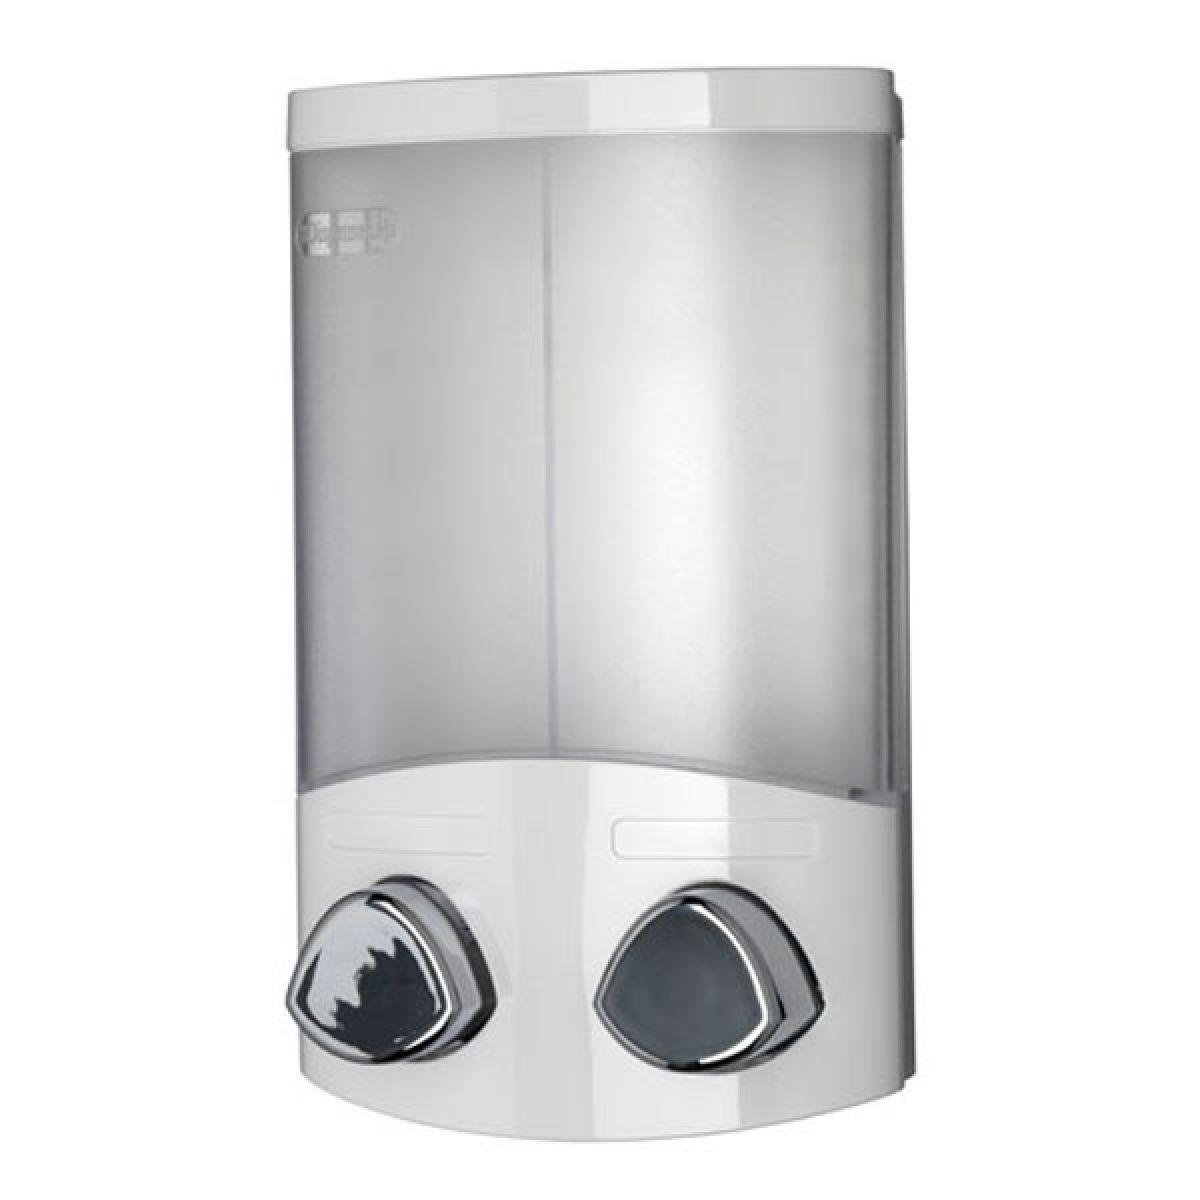 Croydex Euro Soap Dispenser Duo in White